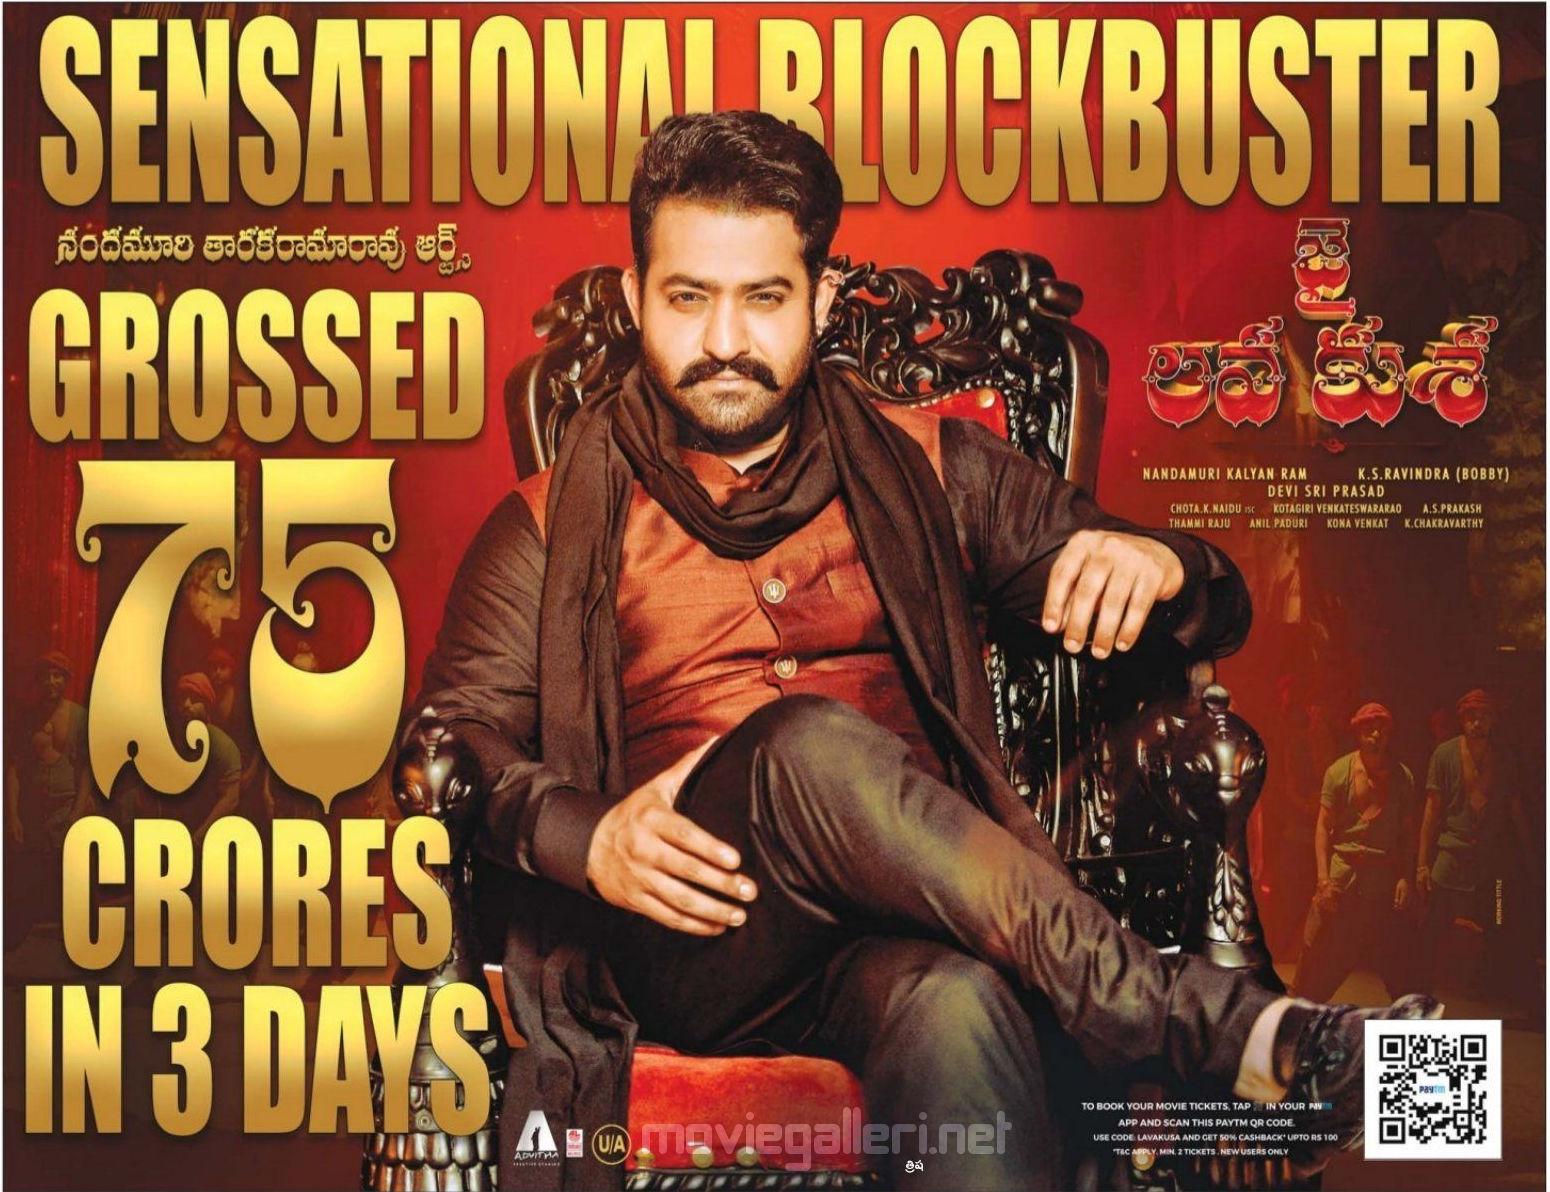 Jr NTR Jai Lava Kusa crossed 75 crores in 3 Days Wallpaper